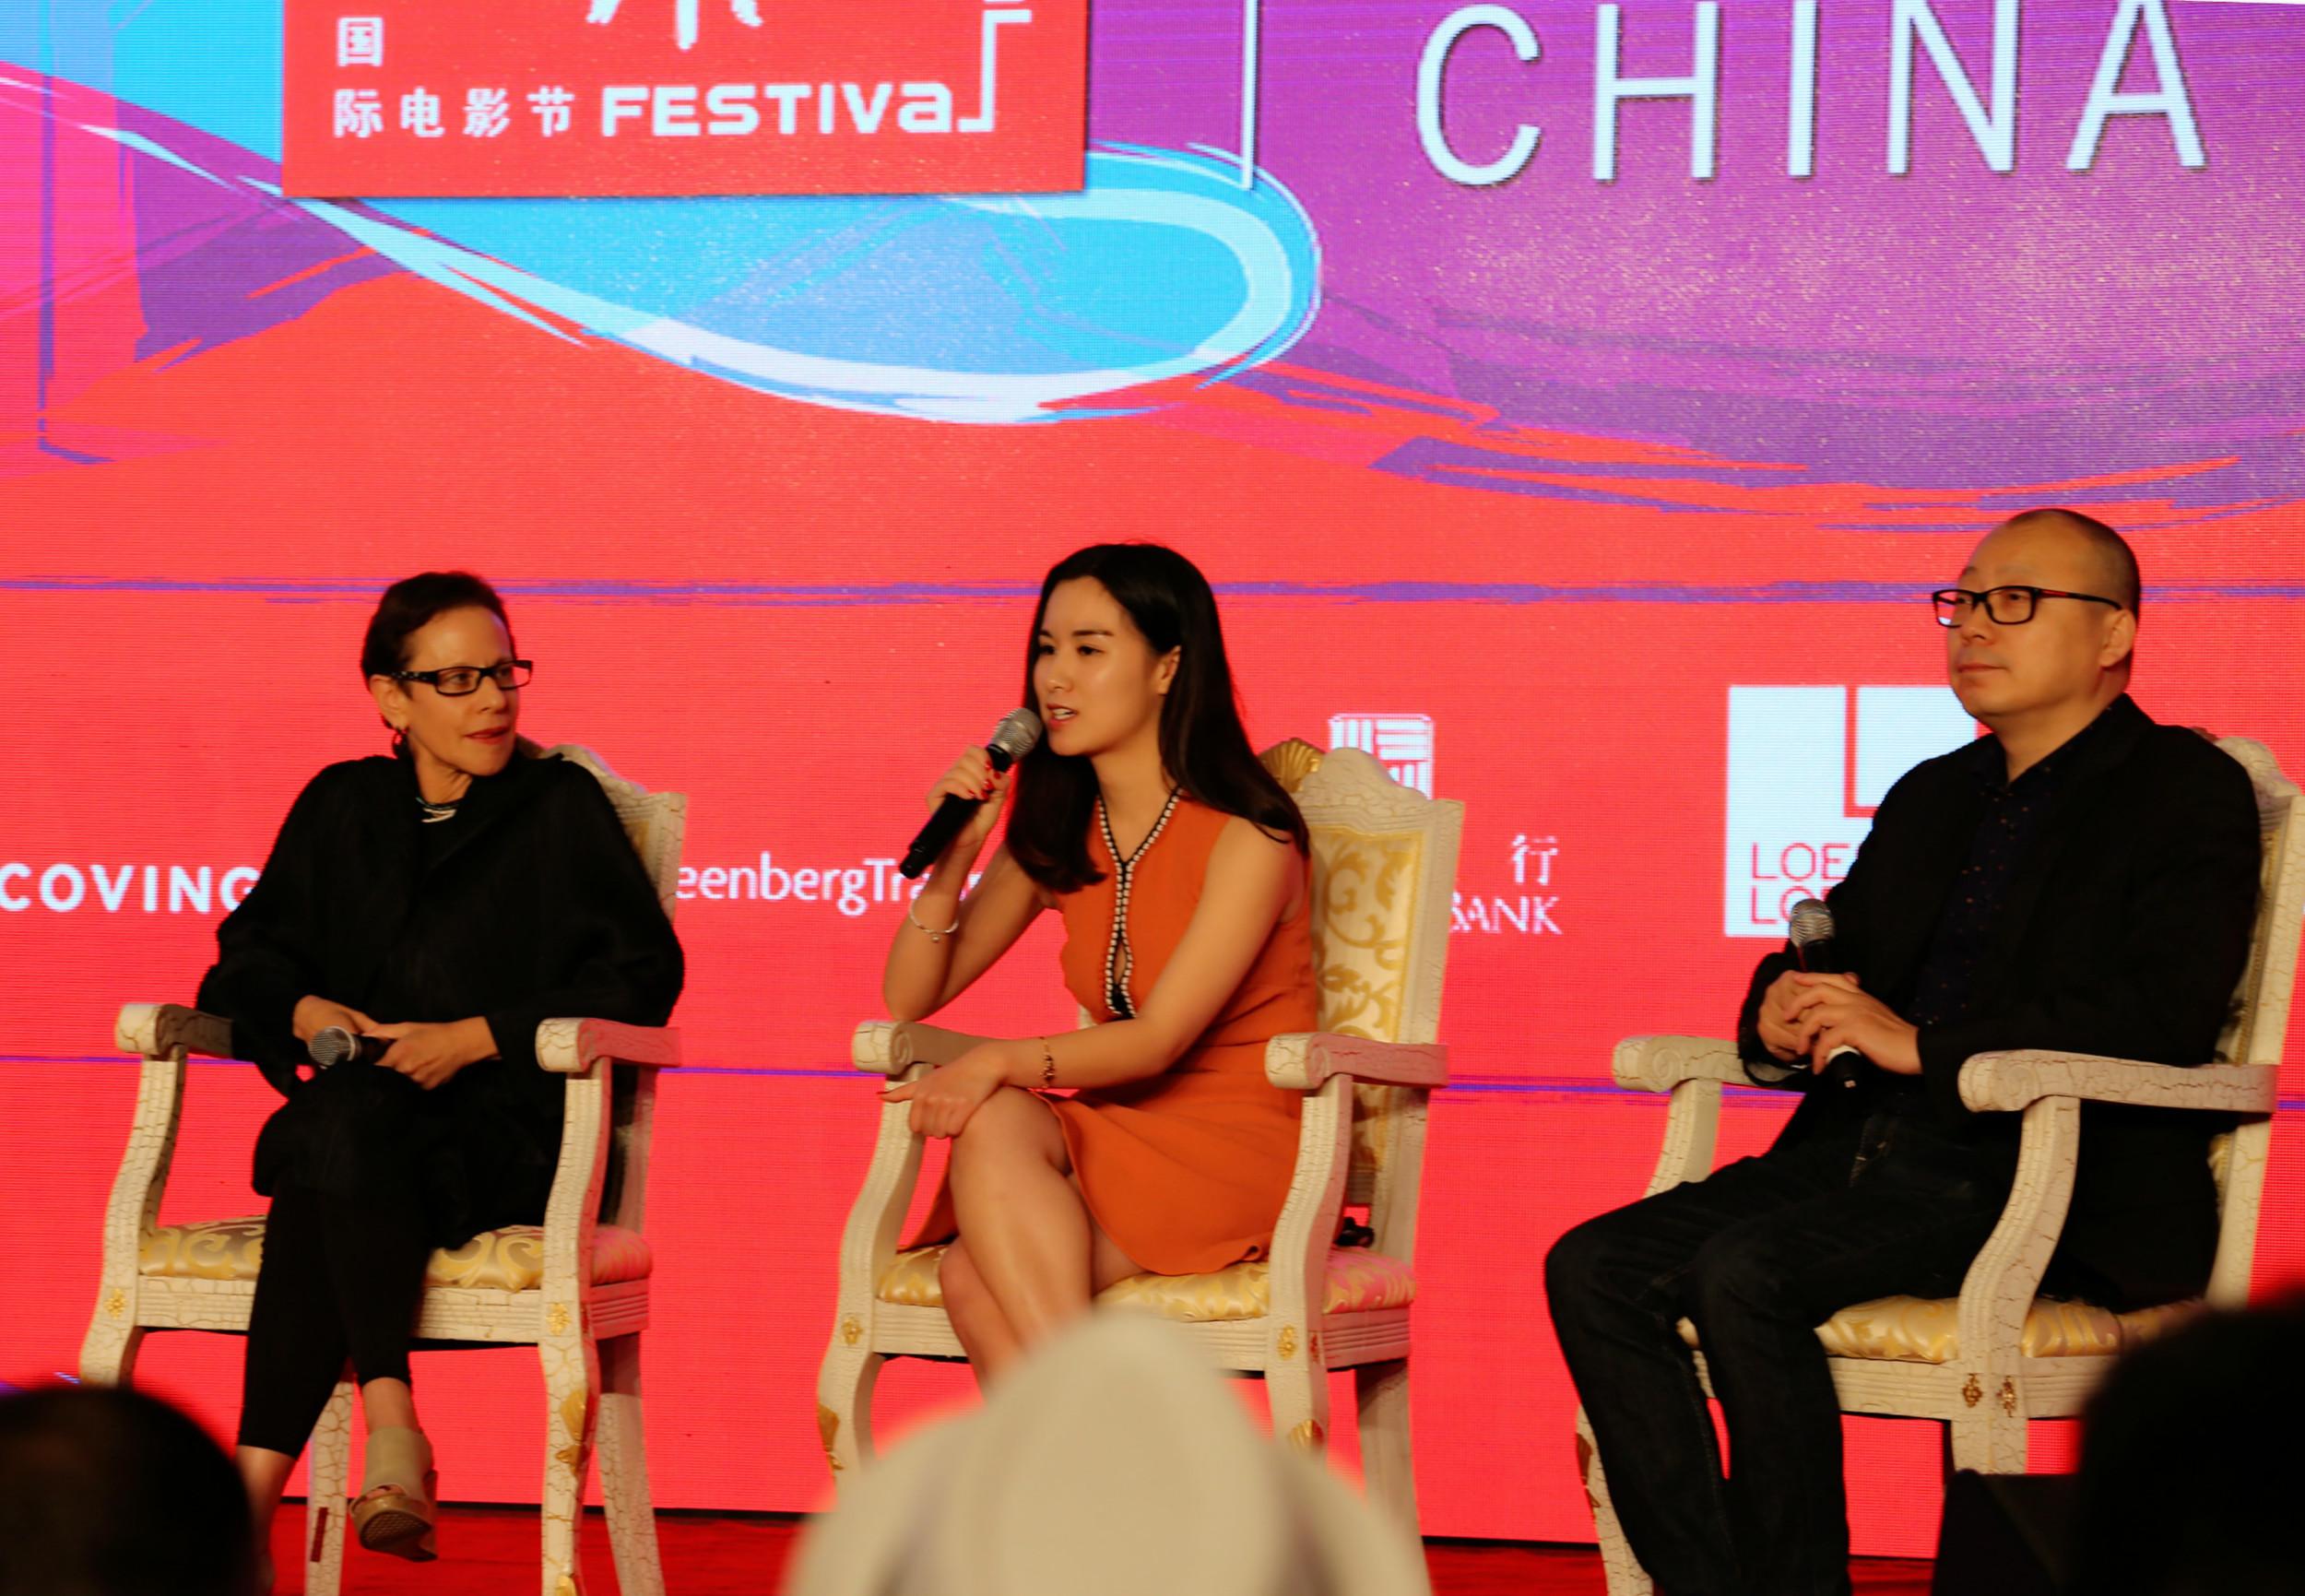 Vantage总裁Michelle Yang受邀参加上影节金融论坛高峰对话